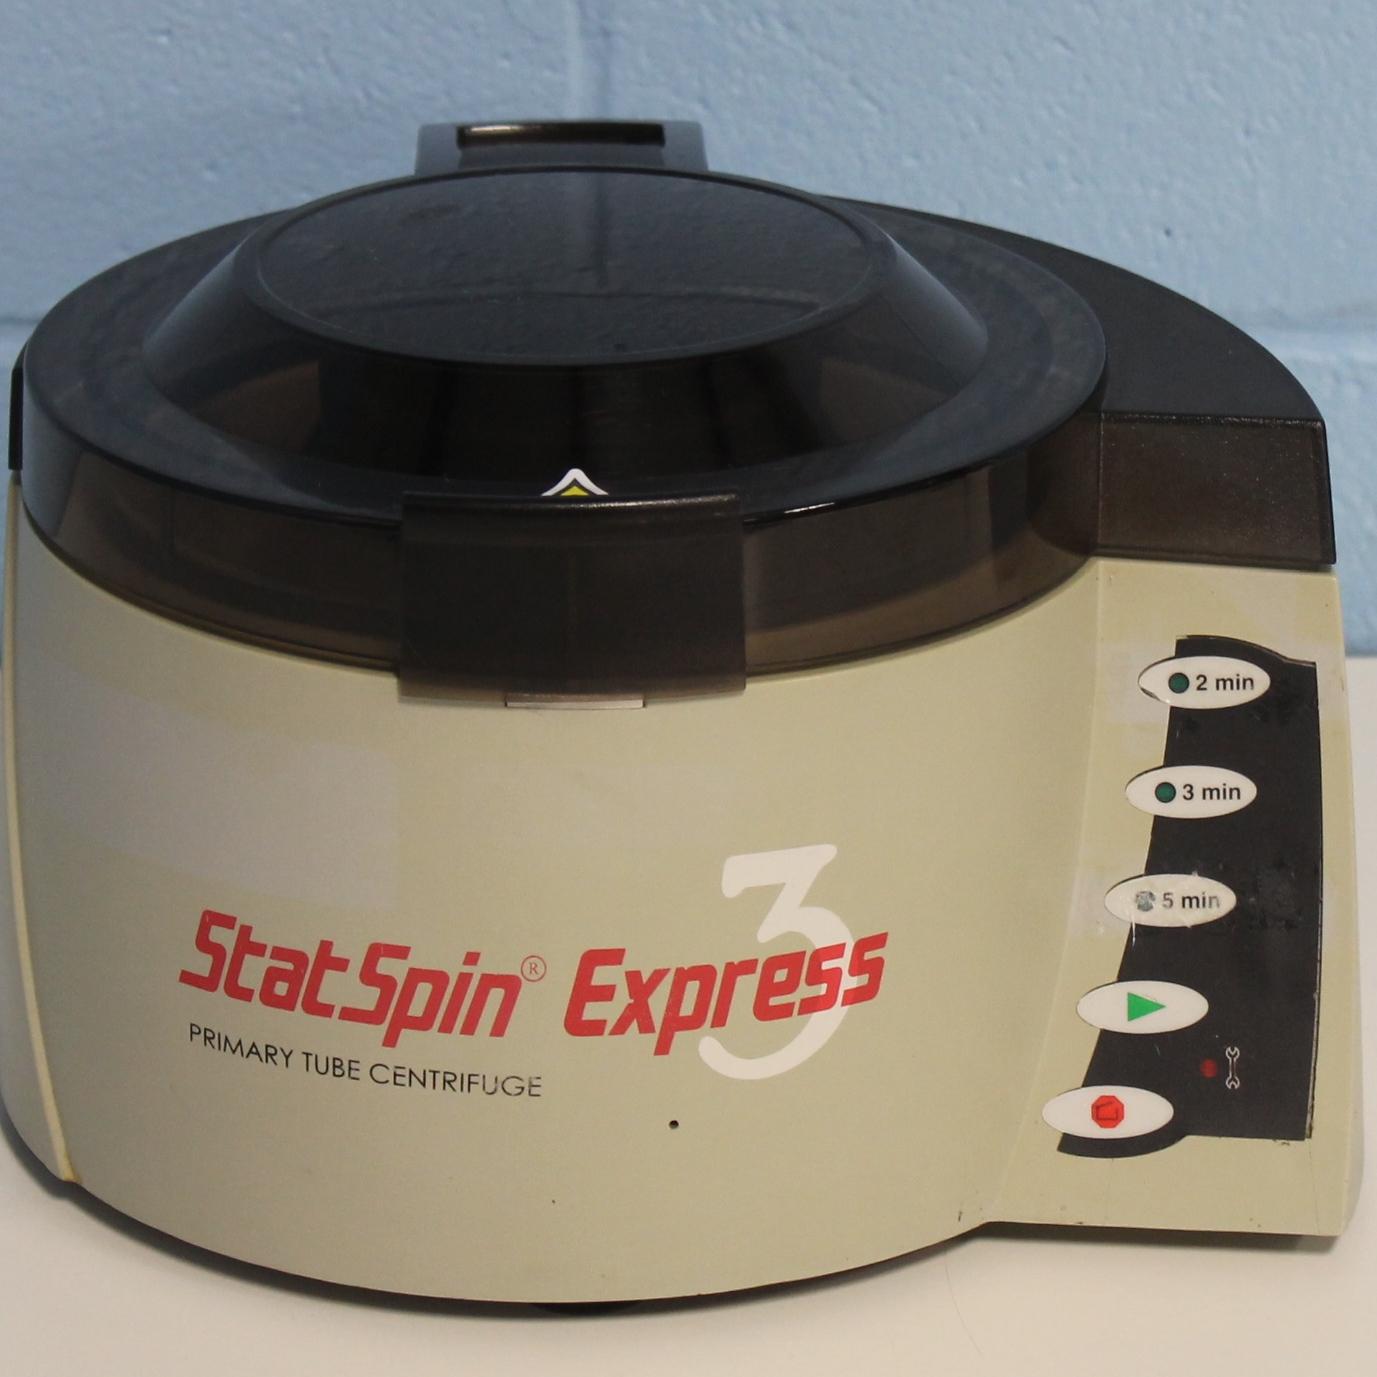 StatSpin Express 3 Centrifuge M502-22 Image